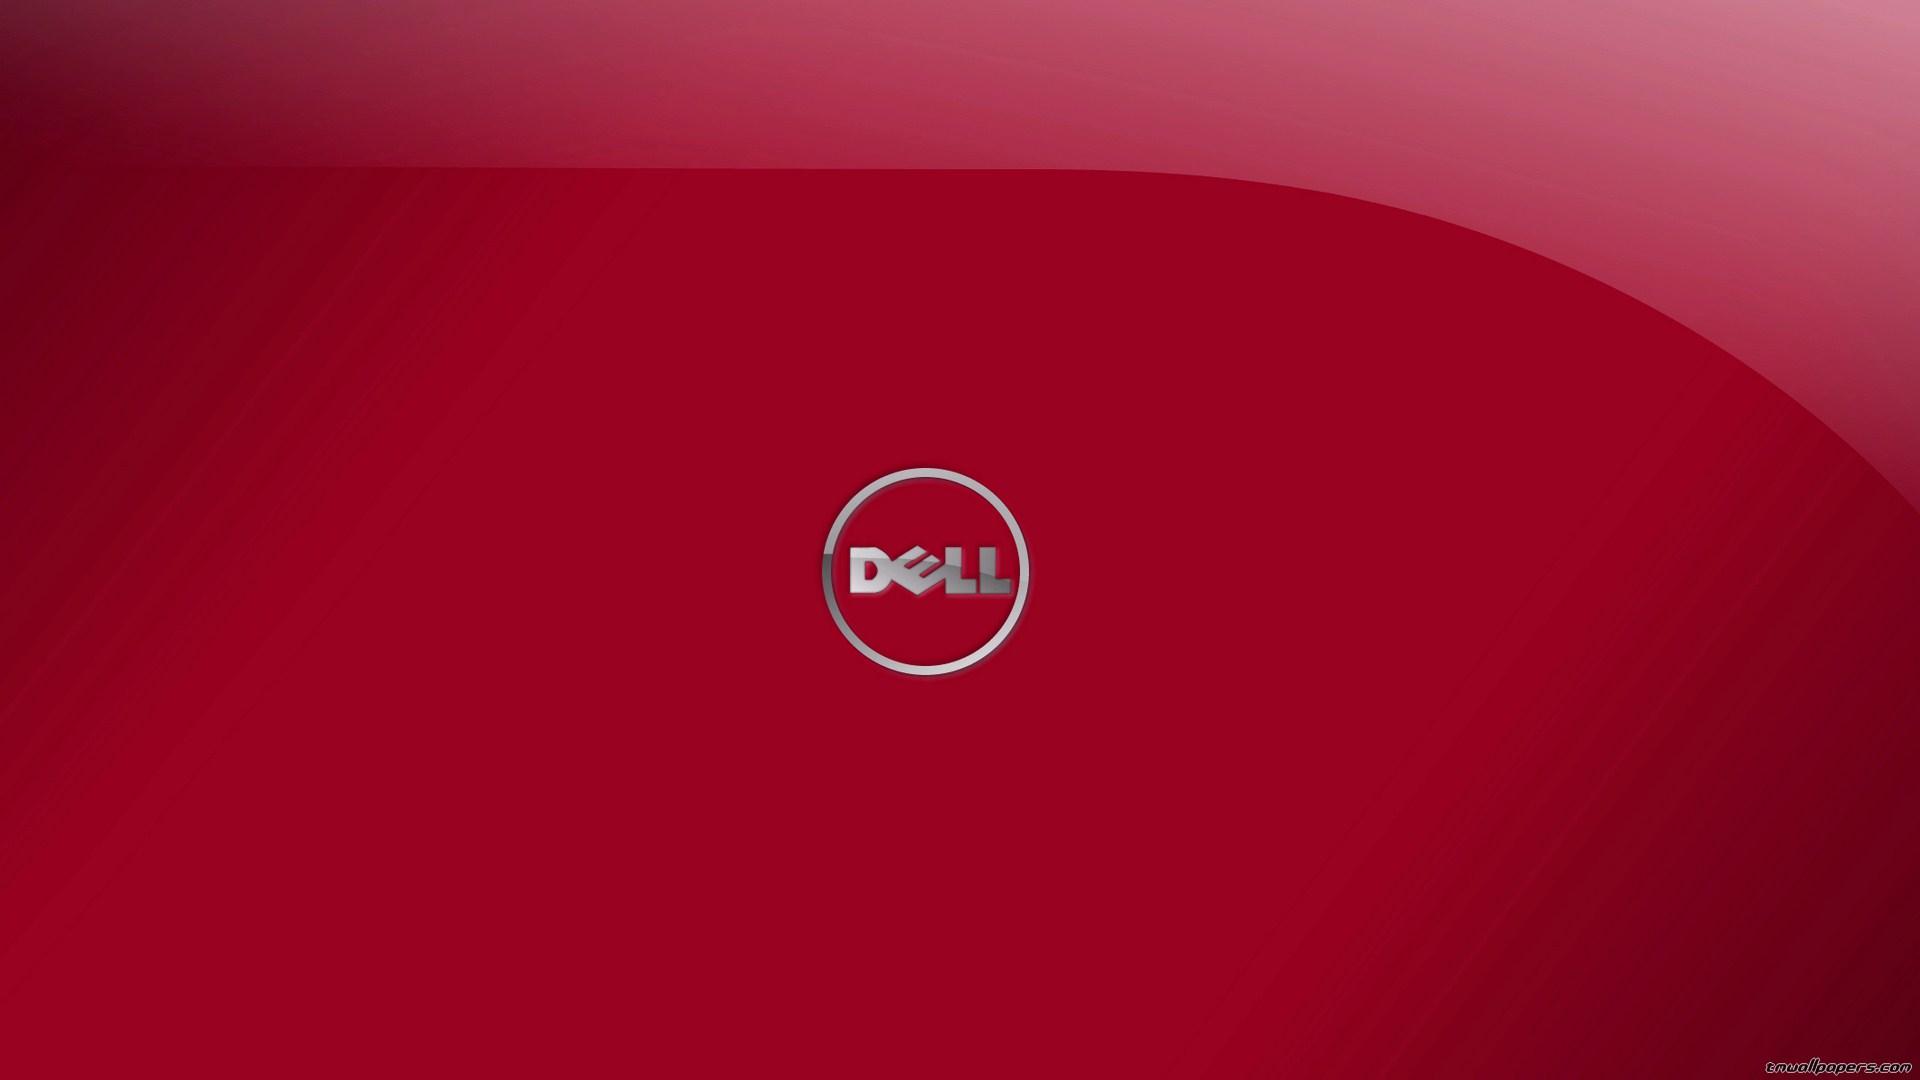 50] Dell Inspiron Wallpaper Background on WallpaperSafari 1920x1080